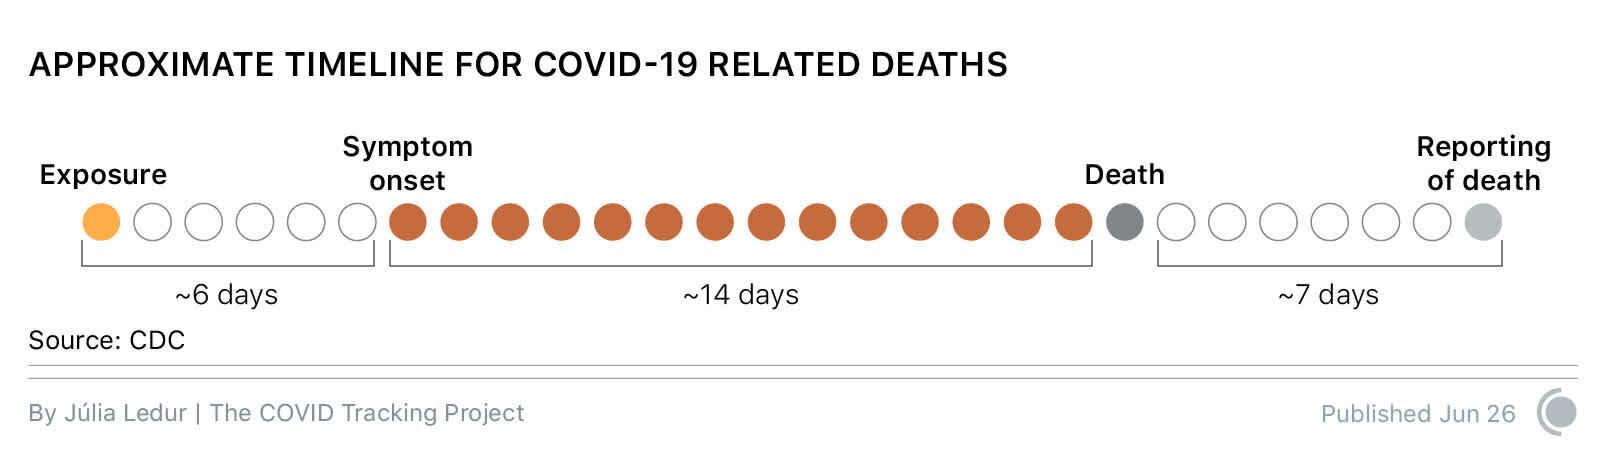 timeline-death-lag__2_.jpg?w=1600&h=450&